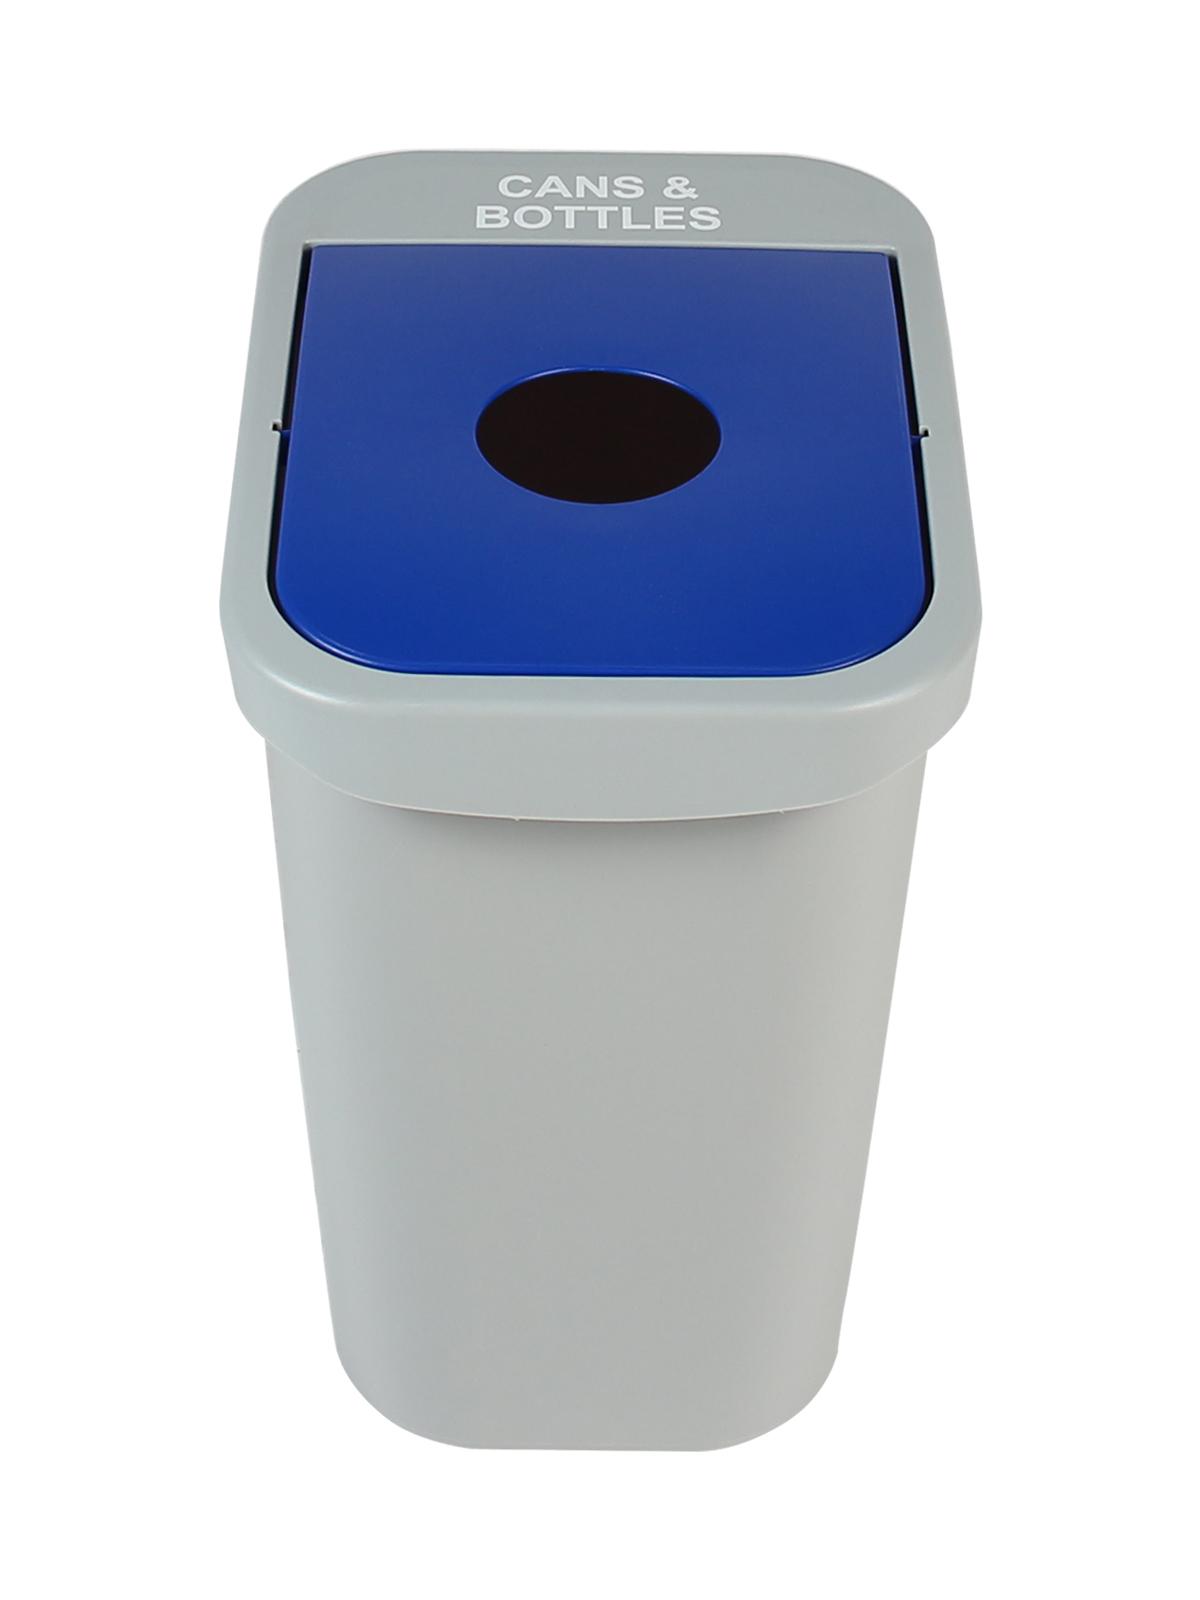 BILLI BOX - Single - 7 G - Cans & Bottles - Circle - Grey-Blue